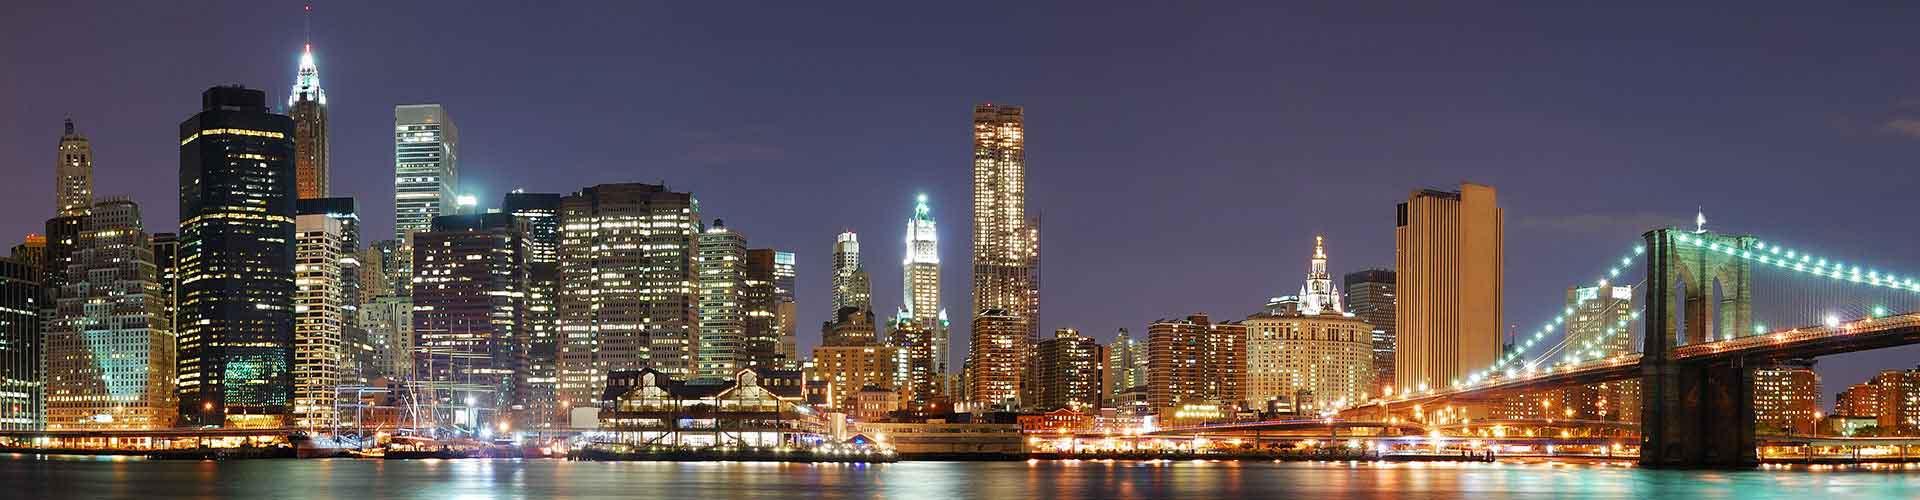 New York - Hostelů v New York. Mapy pro New York, fotky a recenze pro každý hostel v New York.